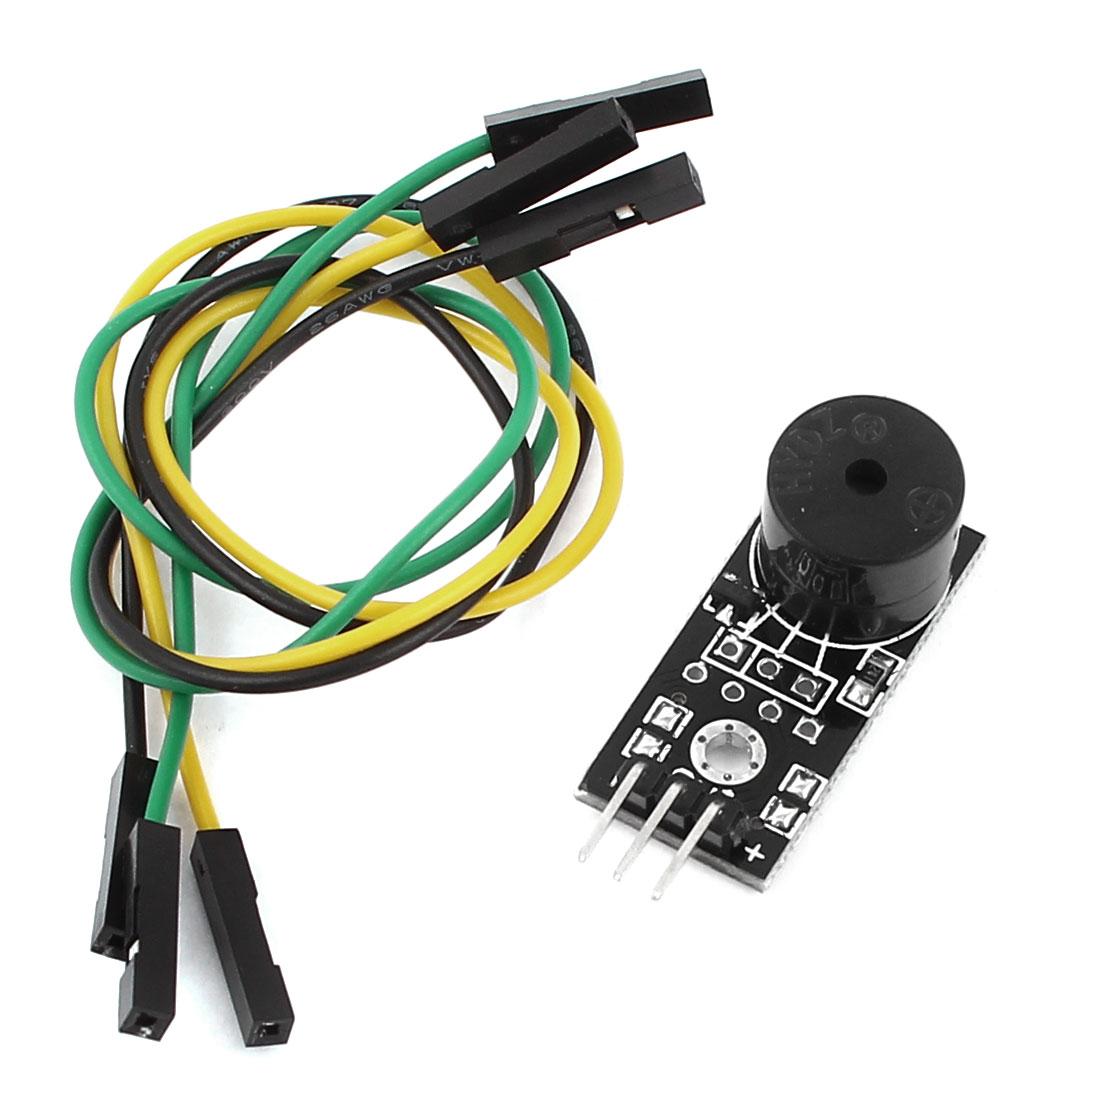 18756H Transistor 3.3V- 5V FR-04 3 Wires Transistor Active Buzzer Alarm Sensor Module